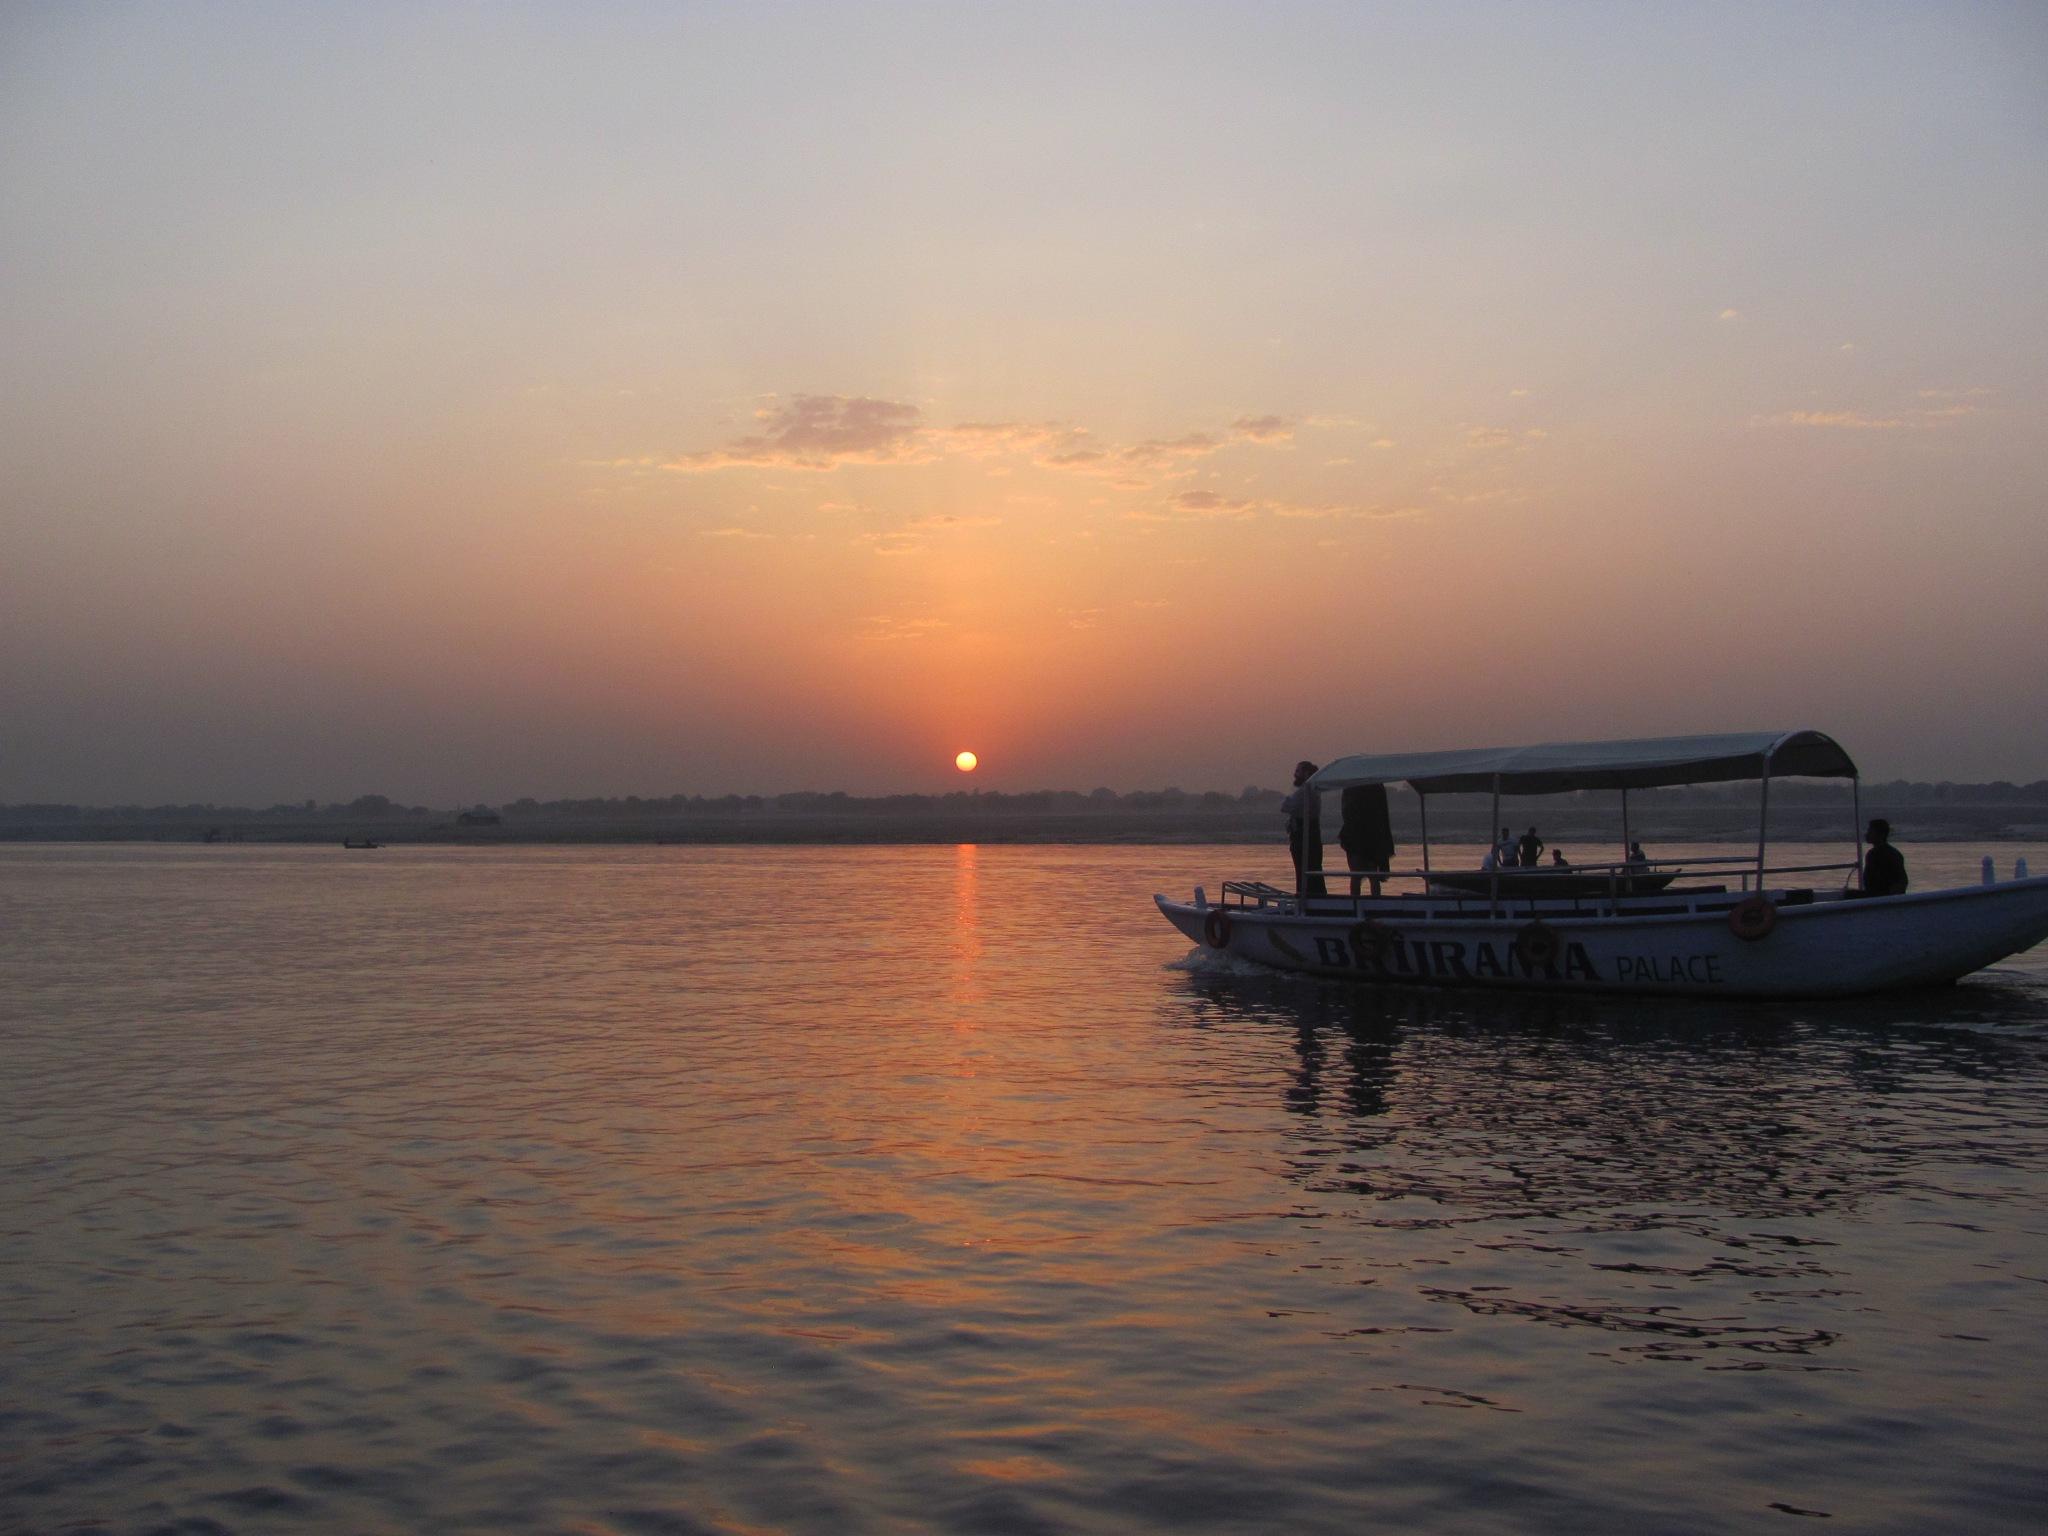 Looking at sunrise by adriana gatej